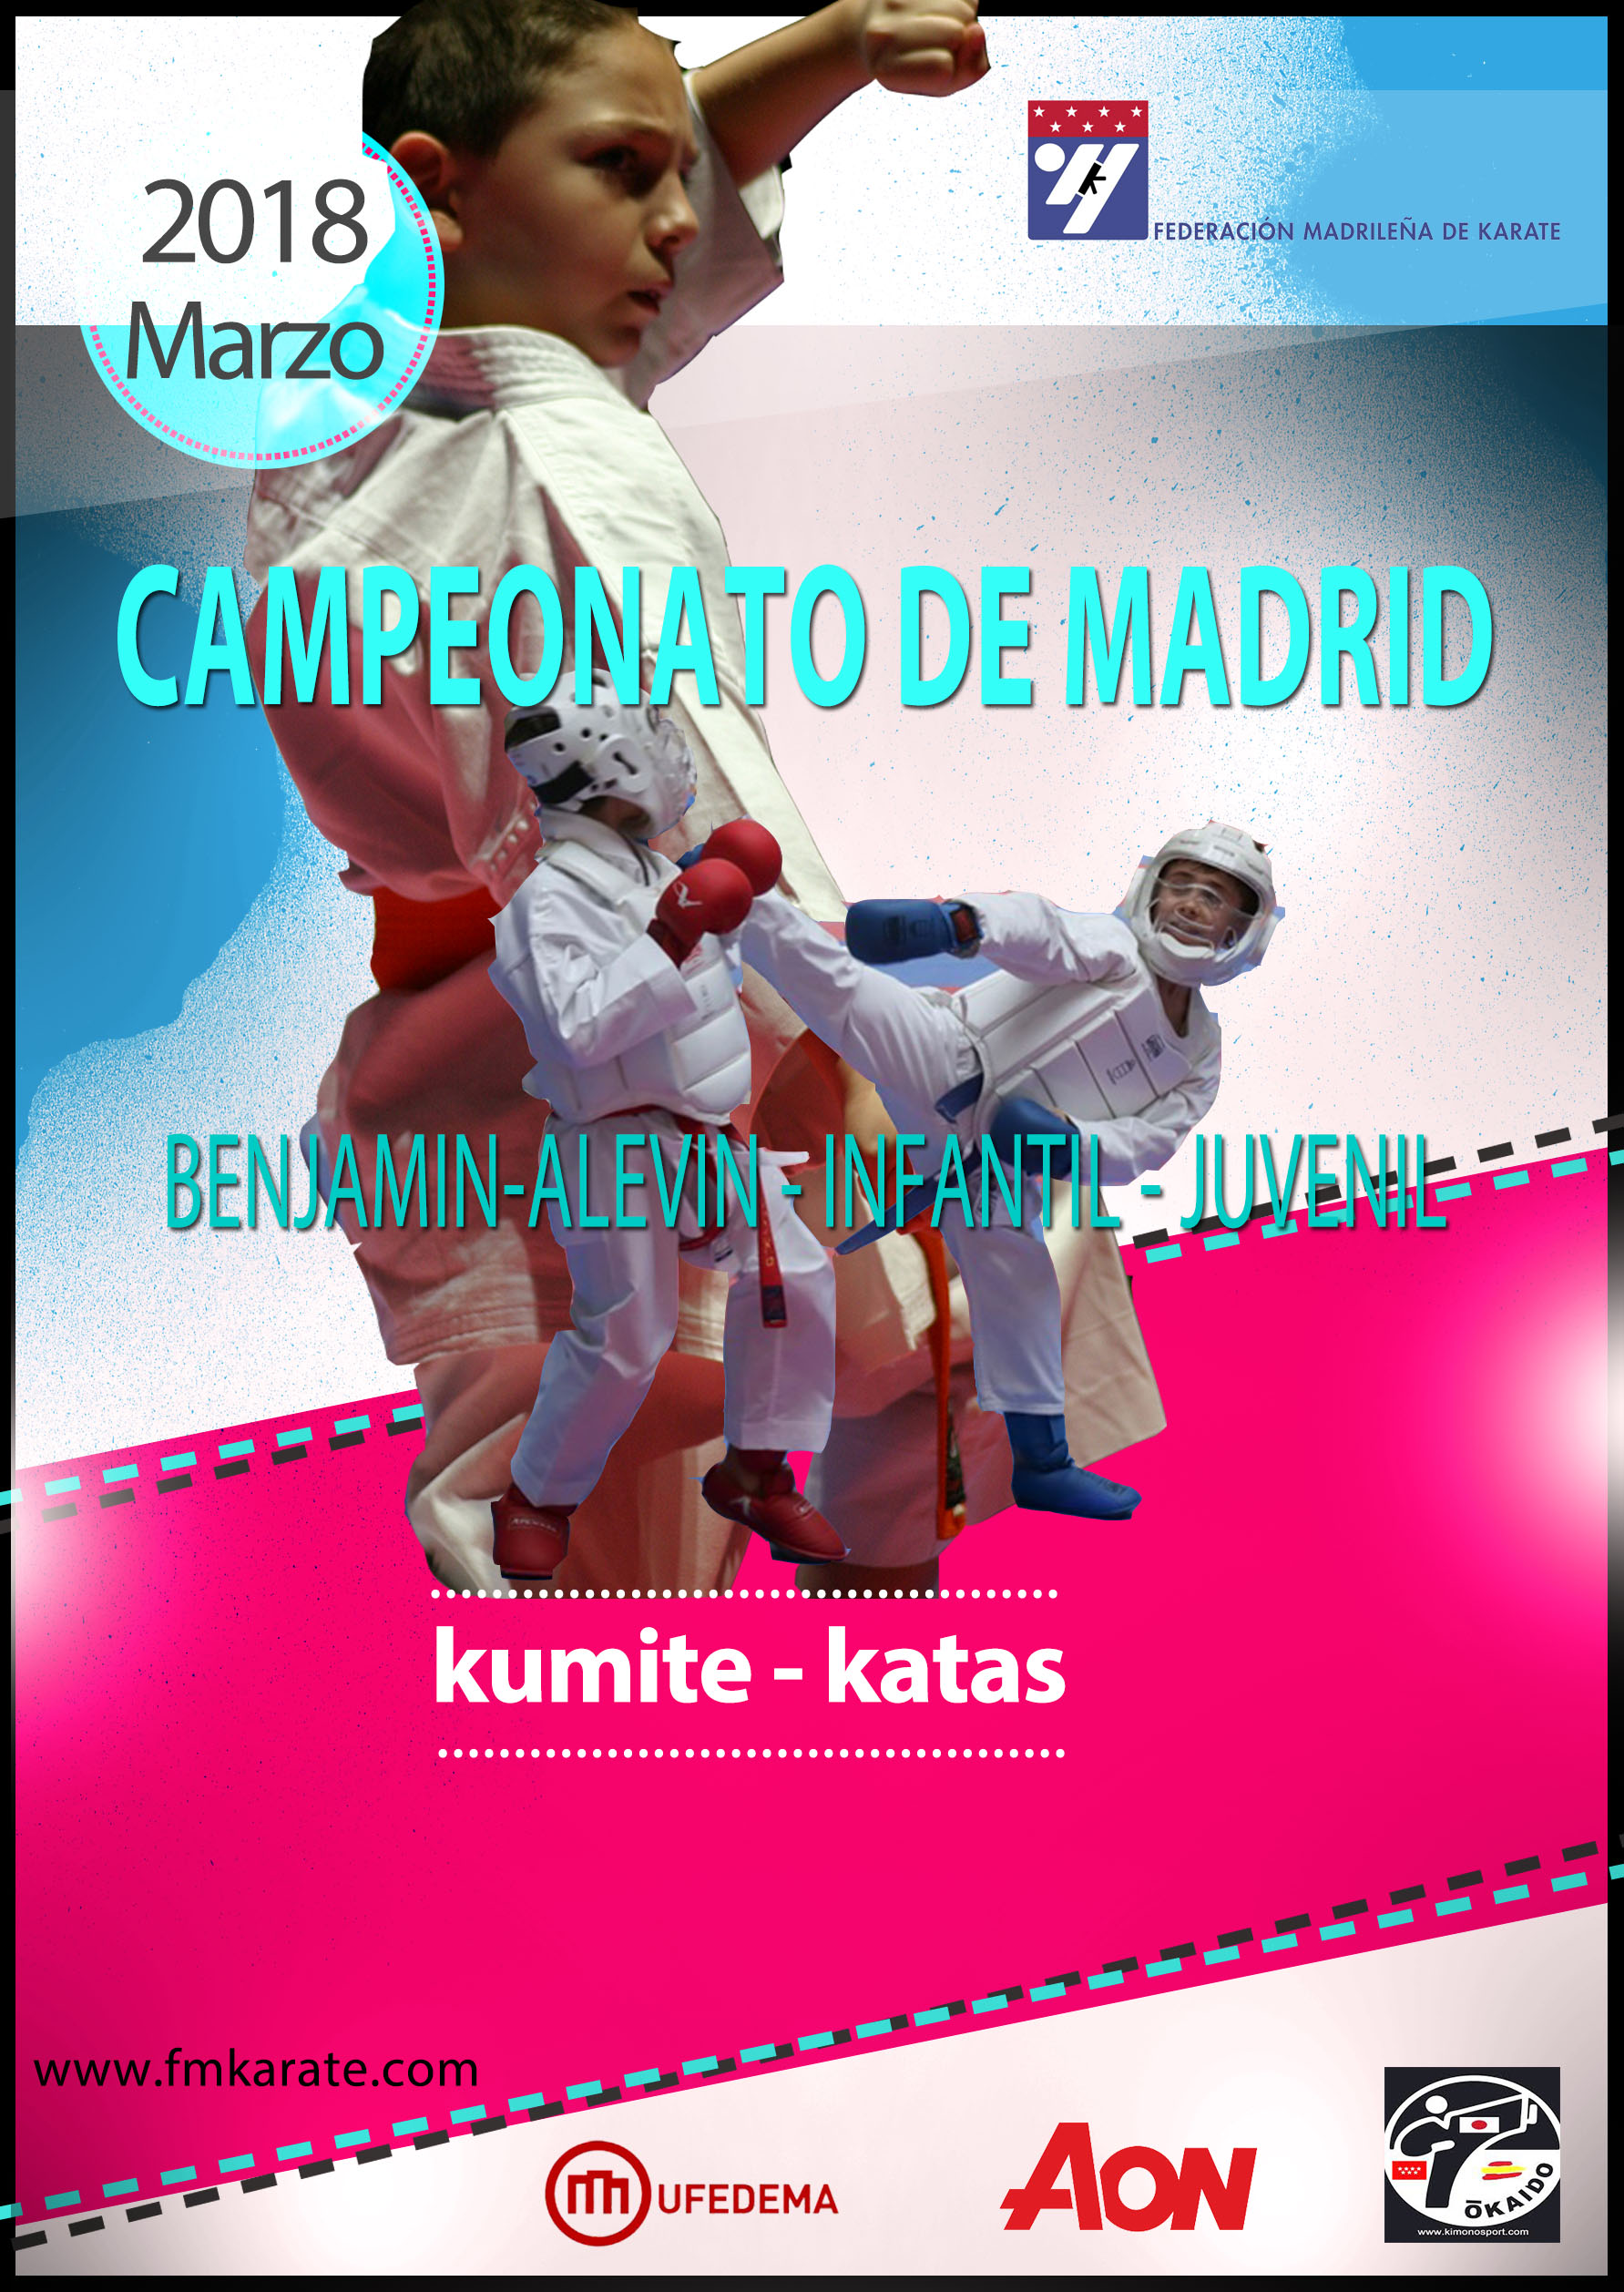 Campeonato de Madrid Infantil 2018